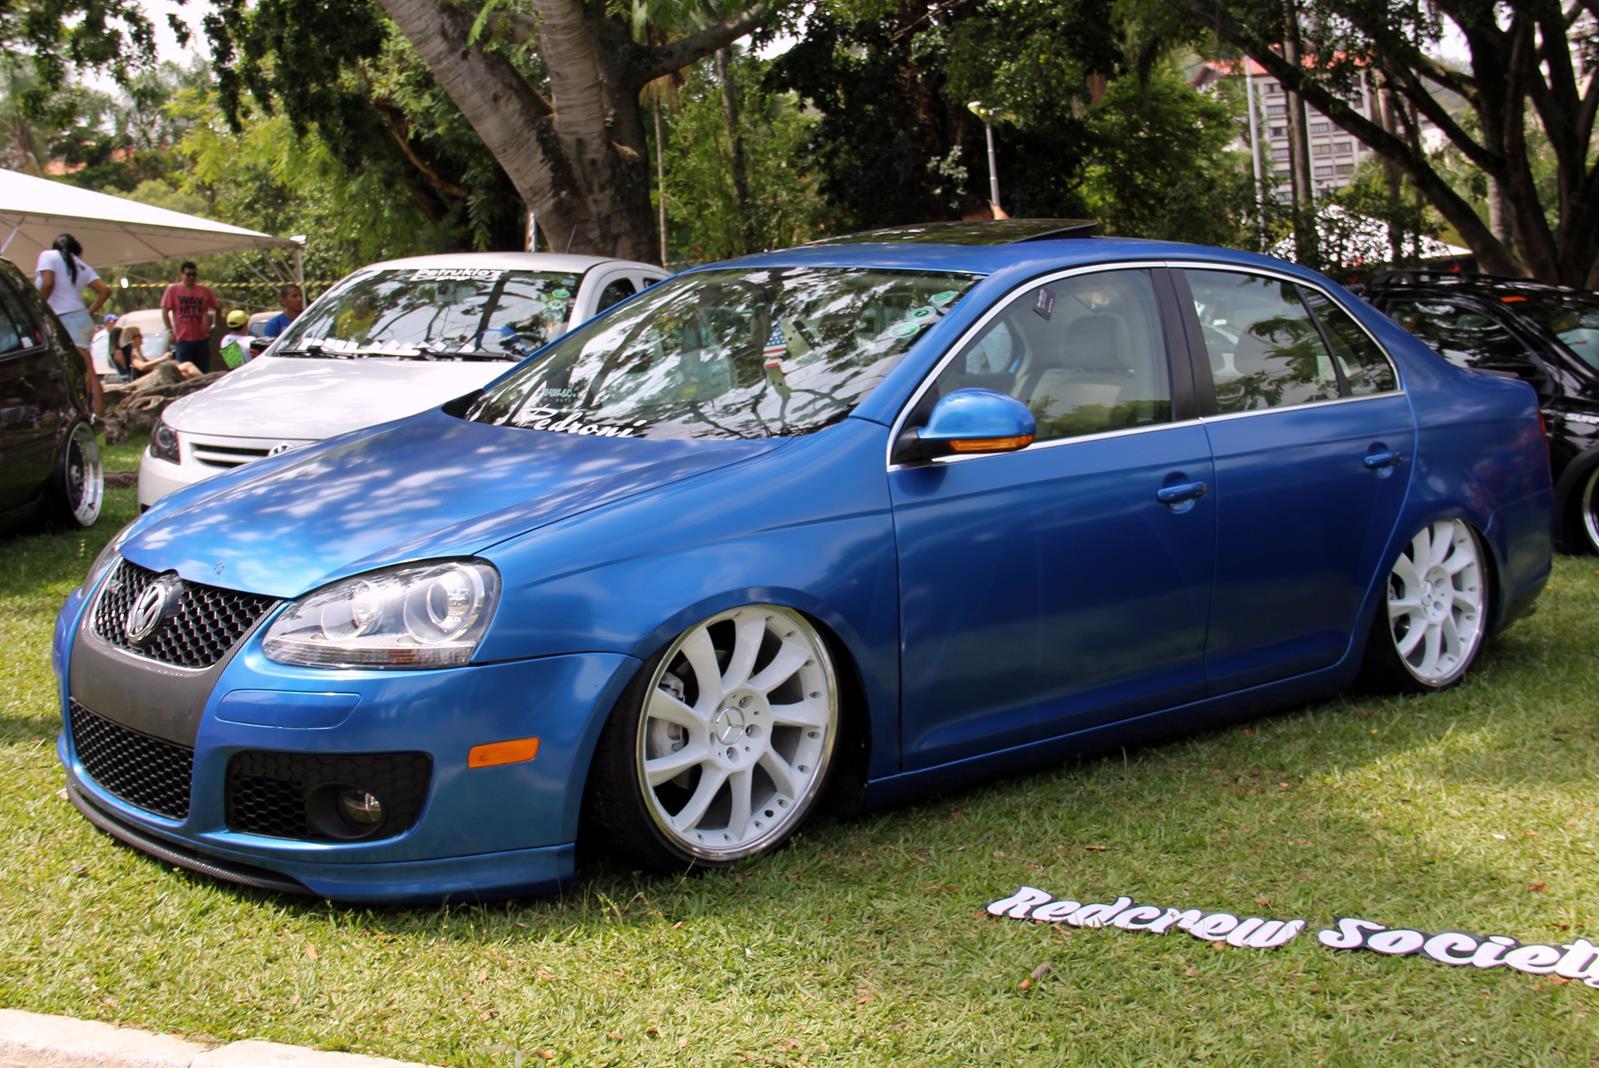 Usar rodas de outras fabricantes europeias, como Mercedes, BMW, Audi e até mesmo Volvo é tendência entre os customizadores